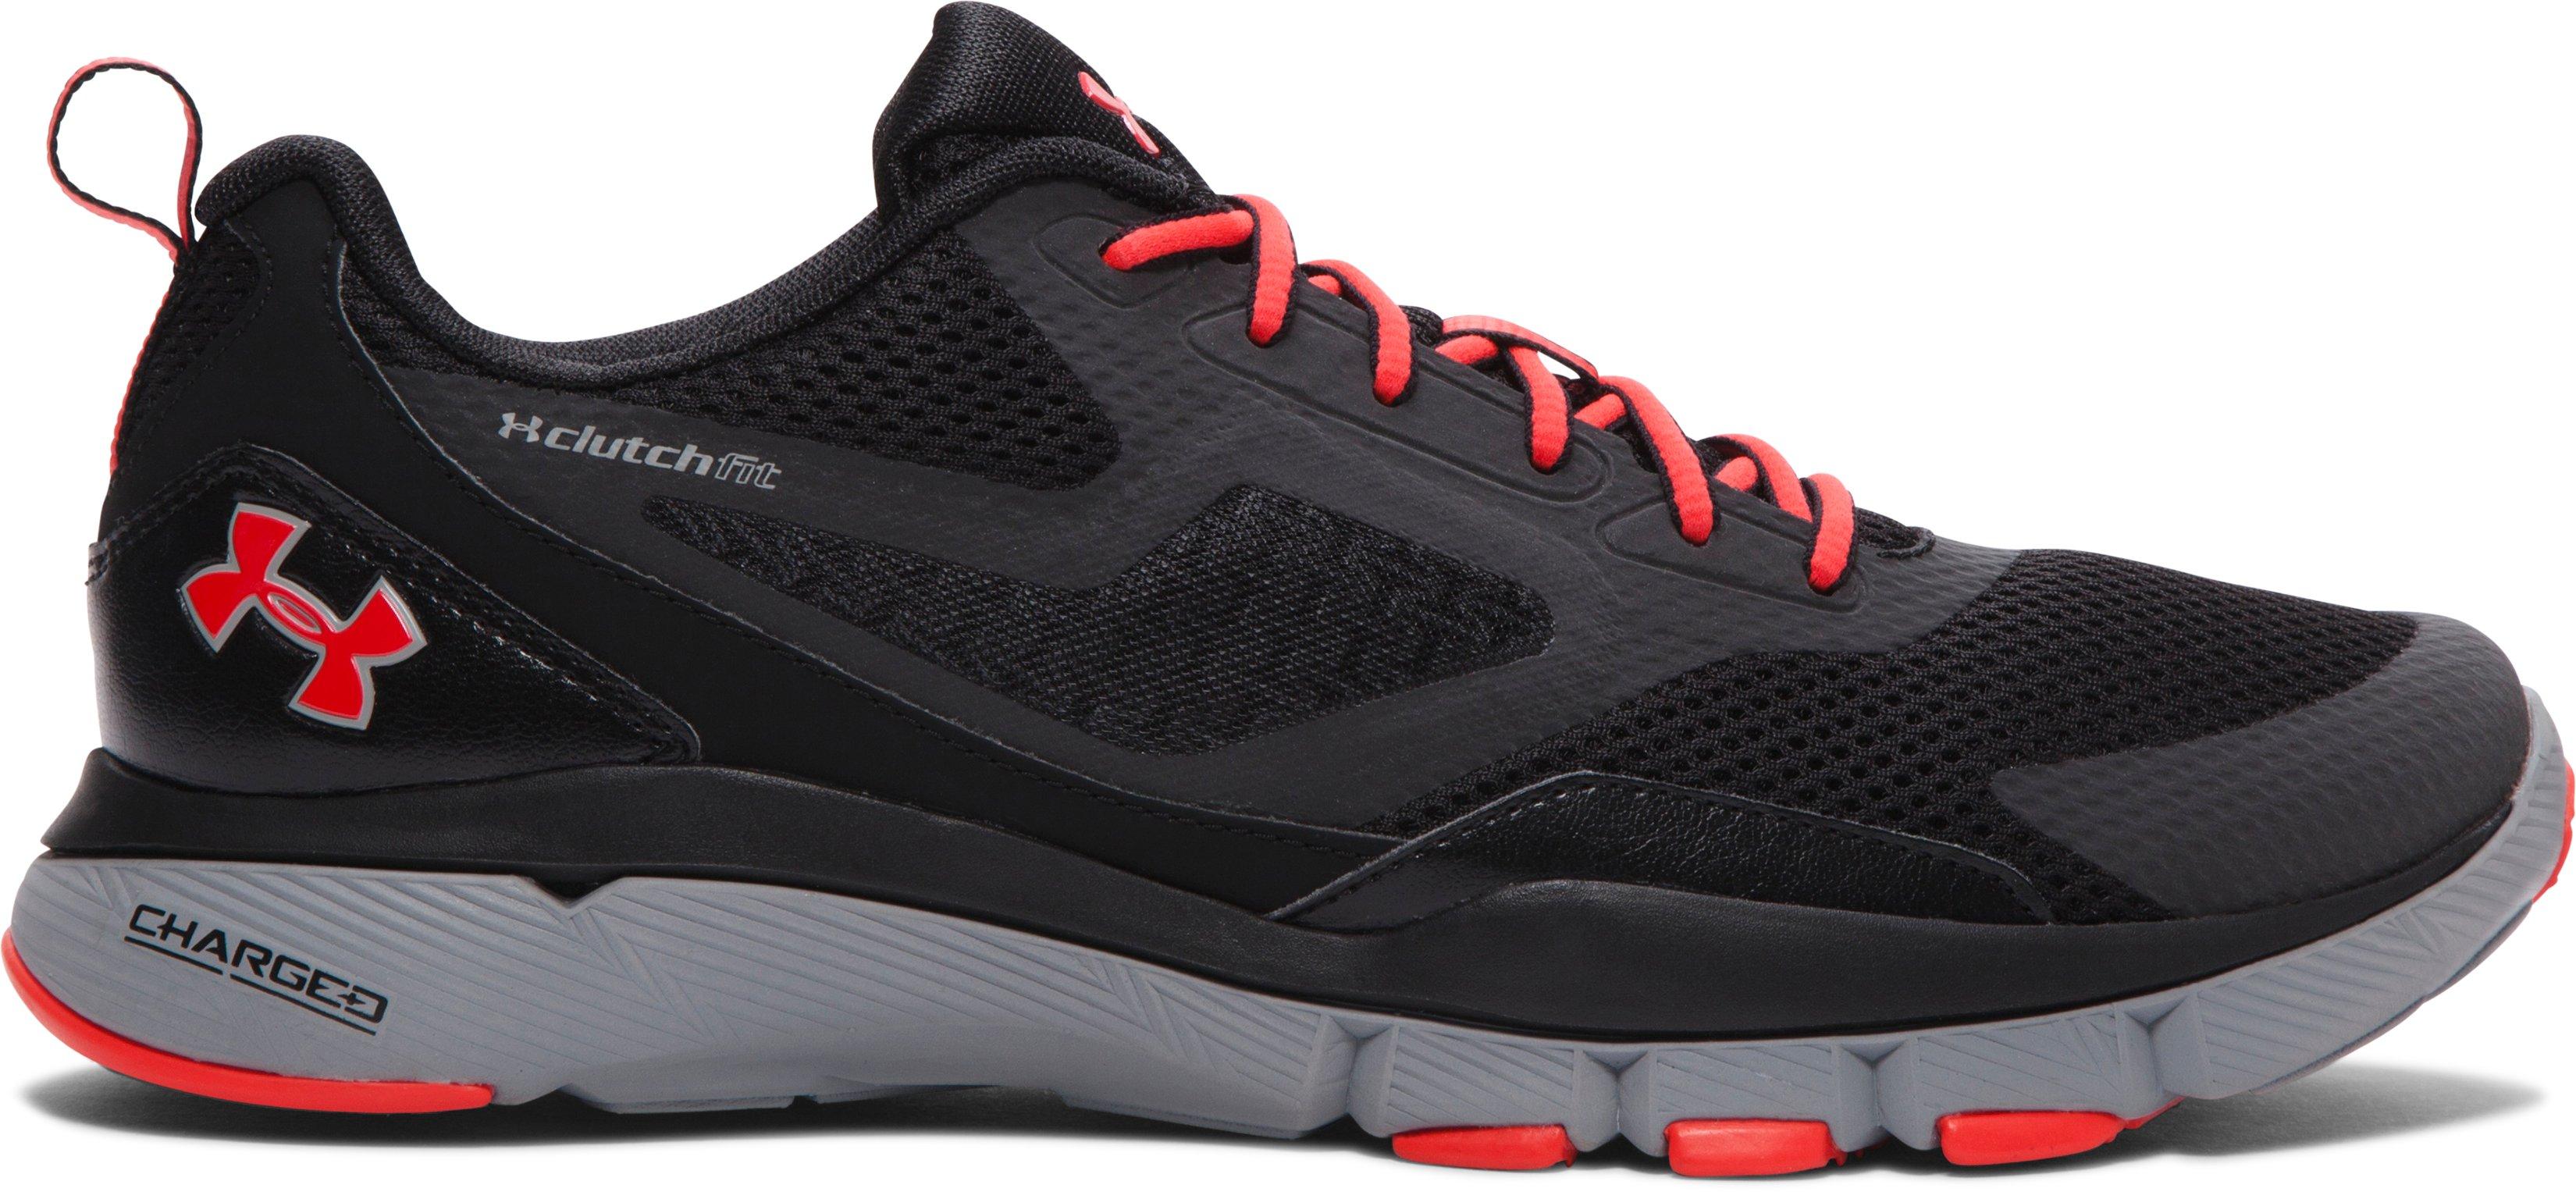 Zapatos de Training UA Charged One para Hombre, 360 degree view